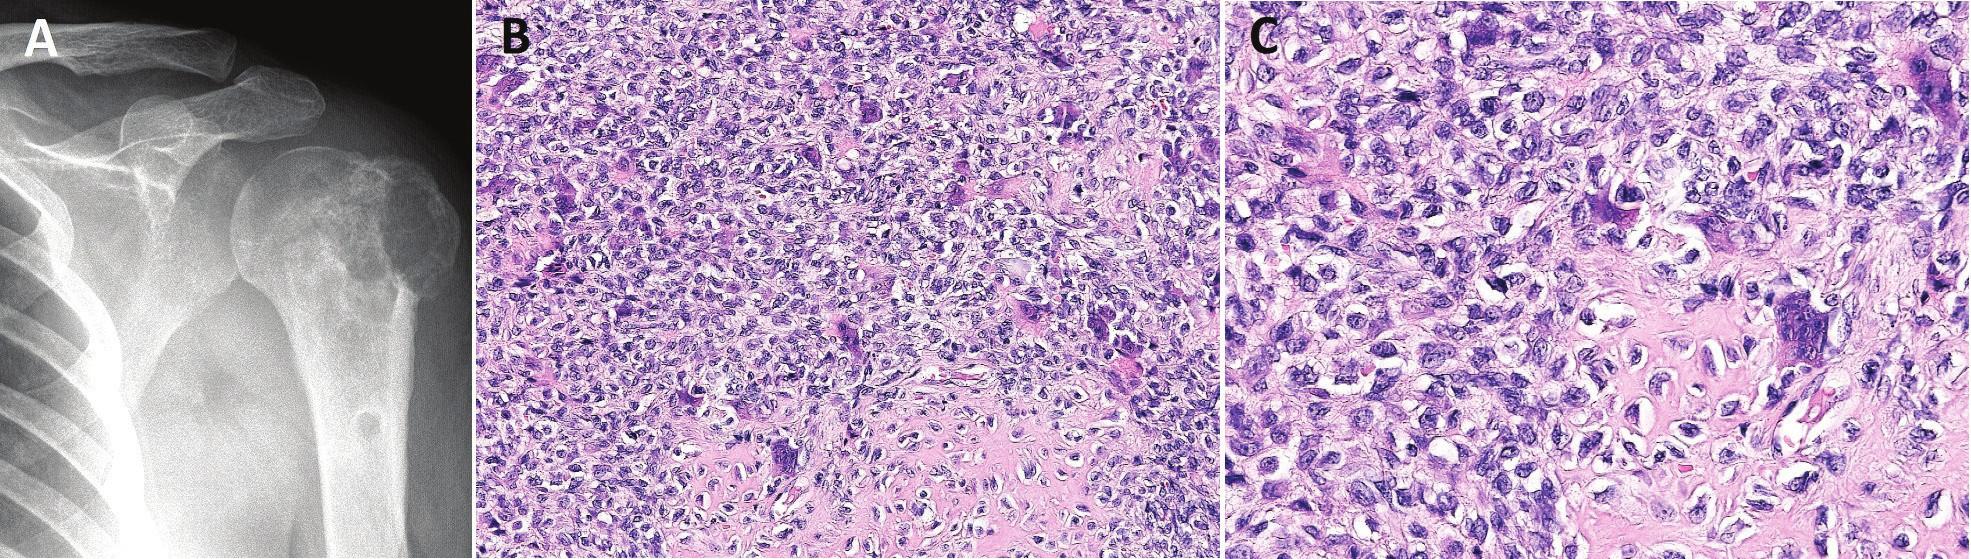 Chondroblastom.